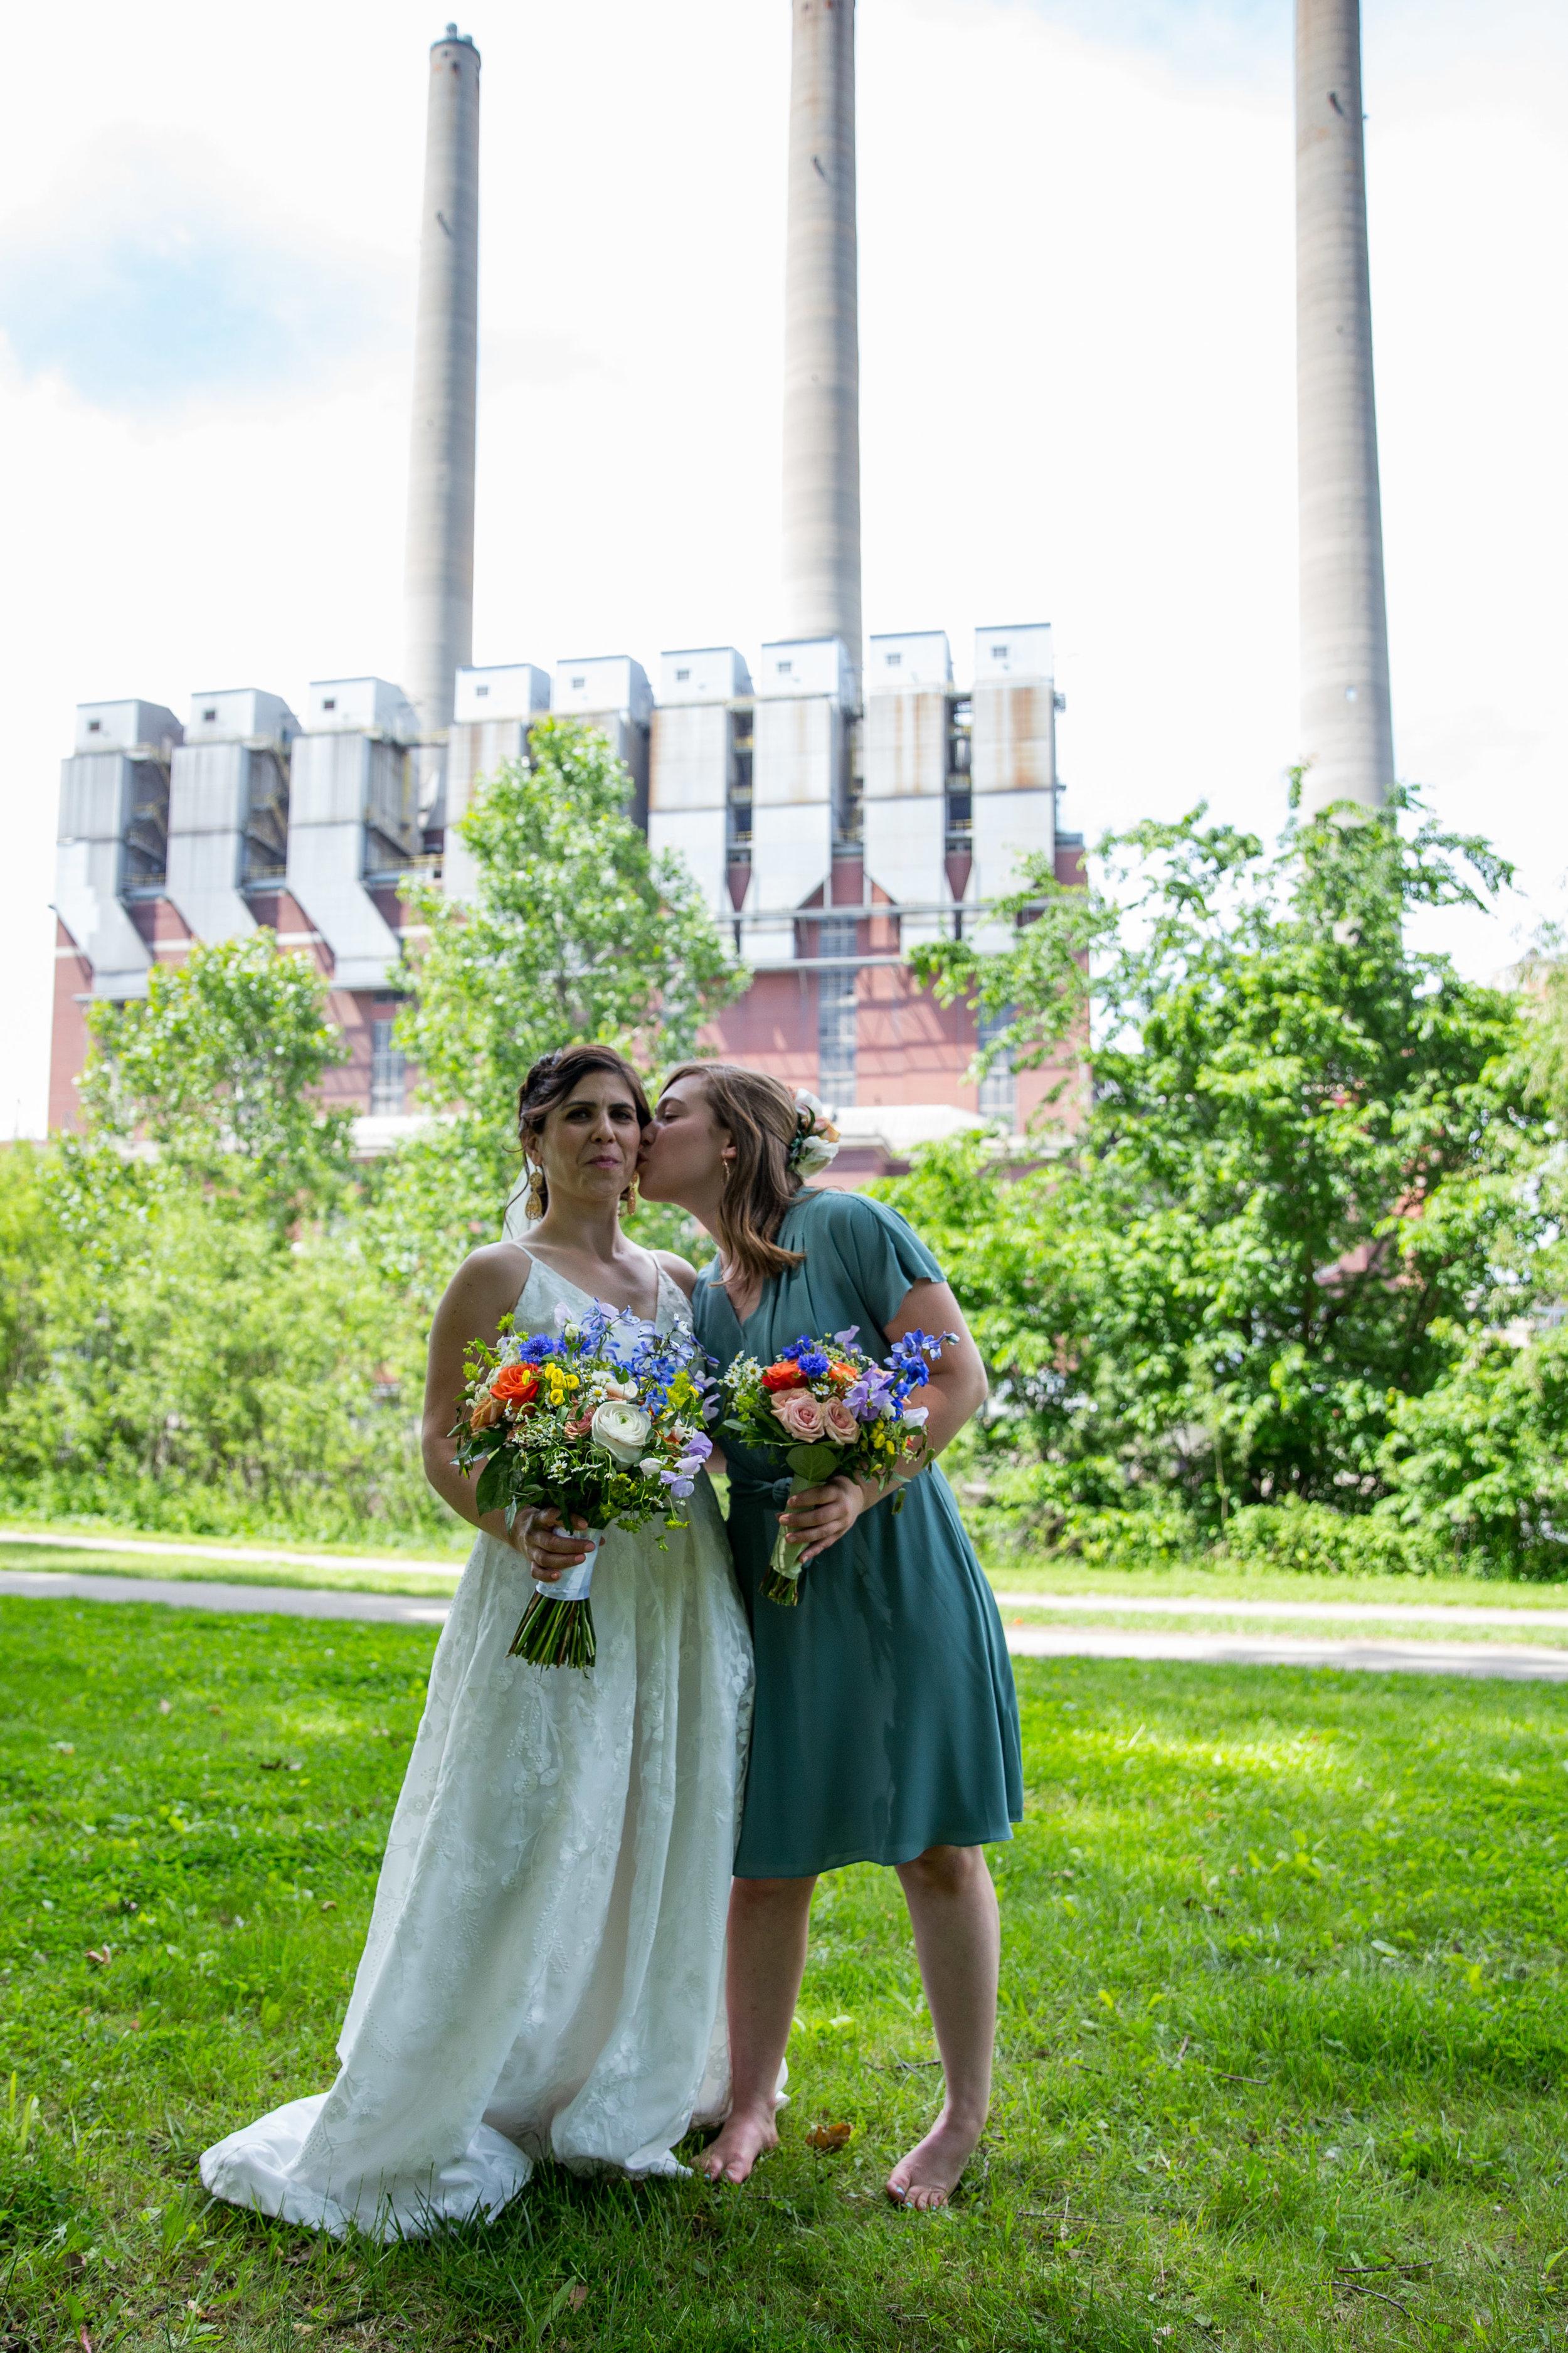 Natalie and Dallas Mooney Wedding 6-8-19_Tania Watt Photography-278.jpg